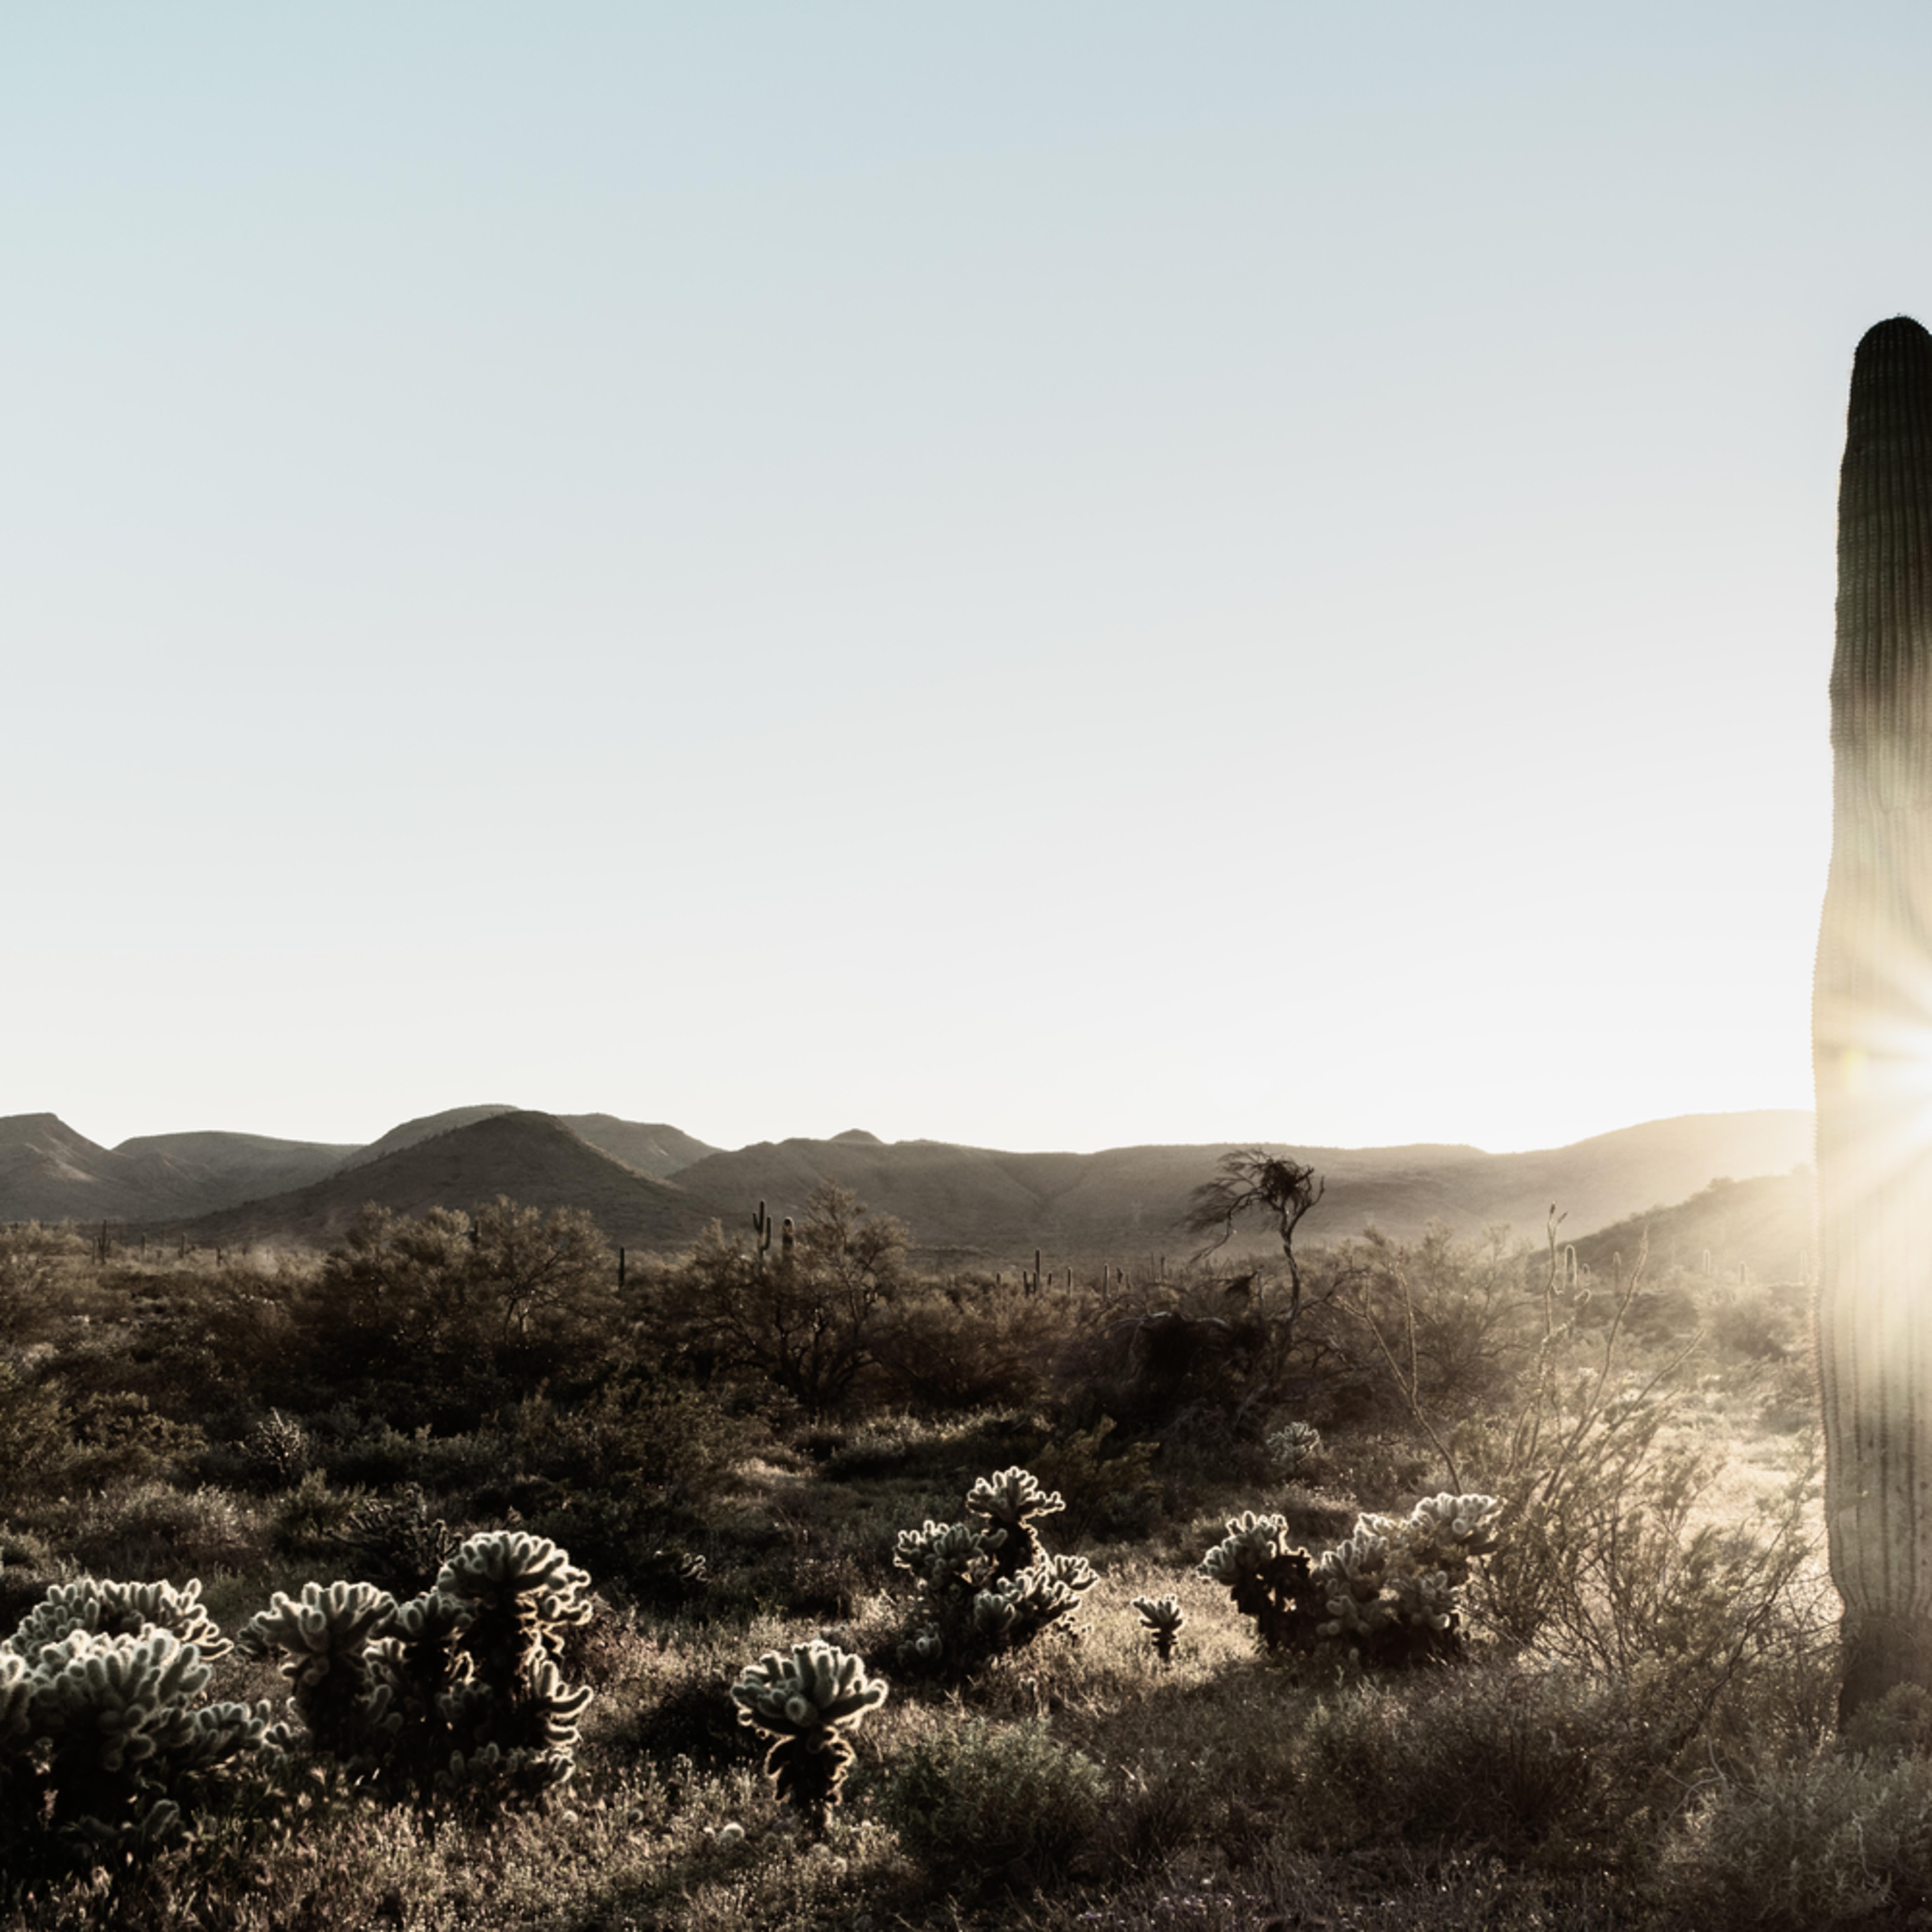 Sonoran desert gold 1 bxmmyb